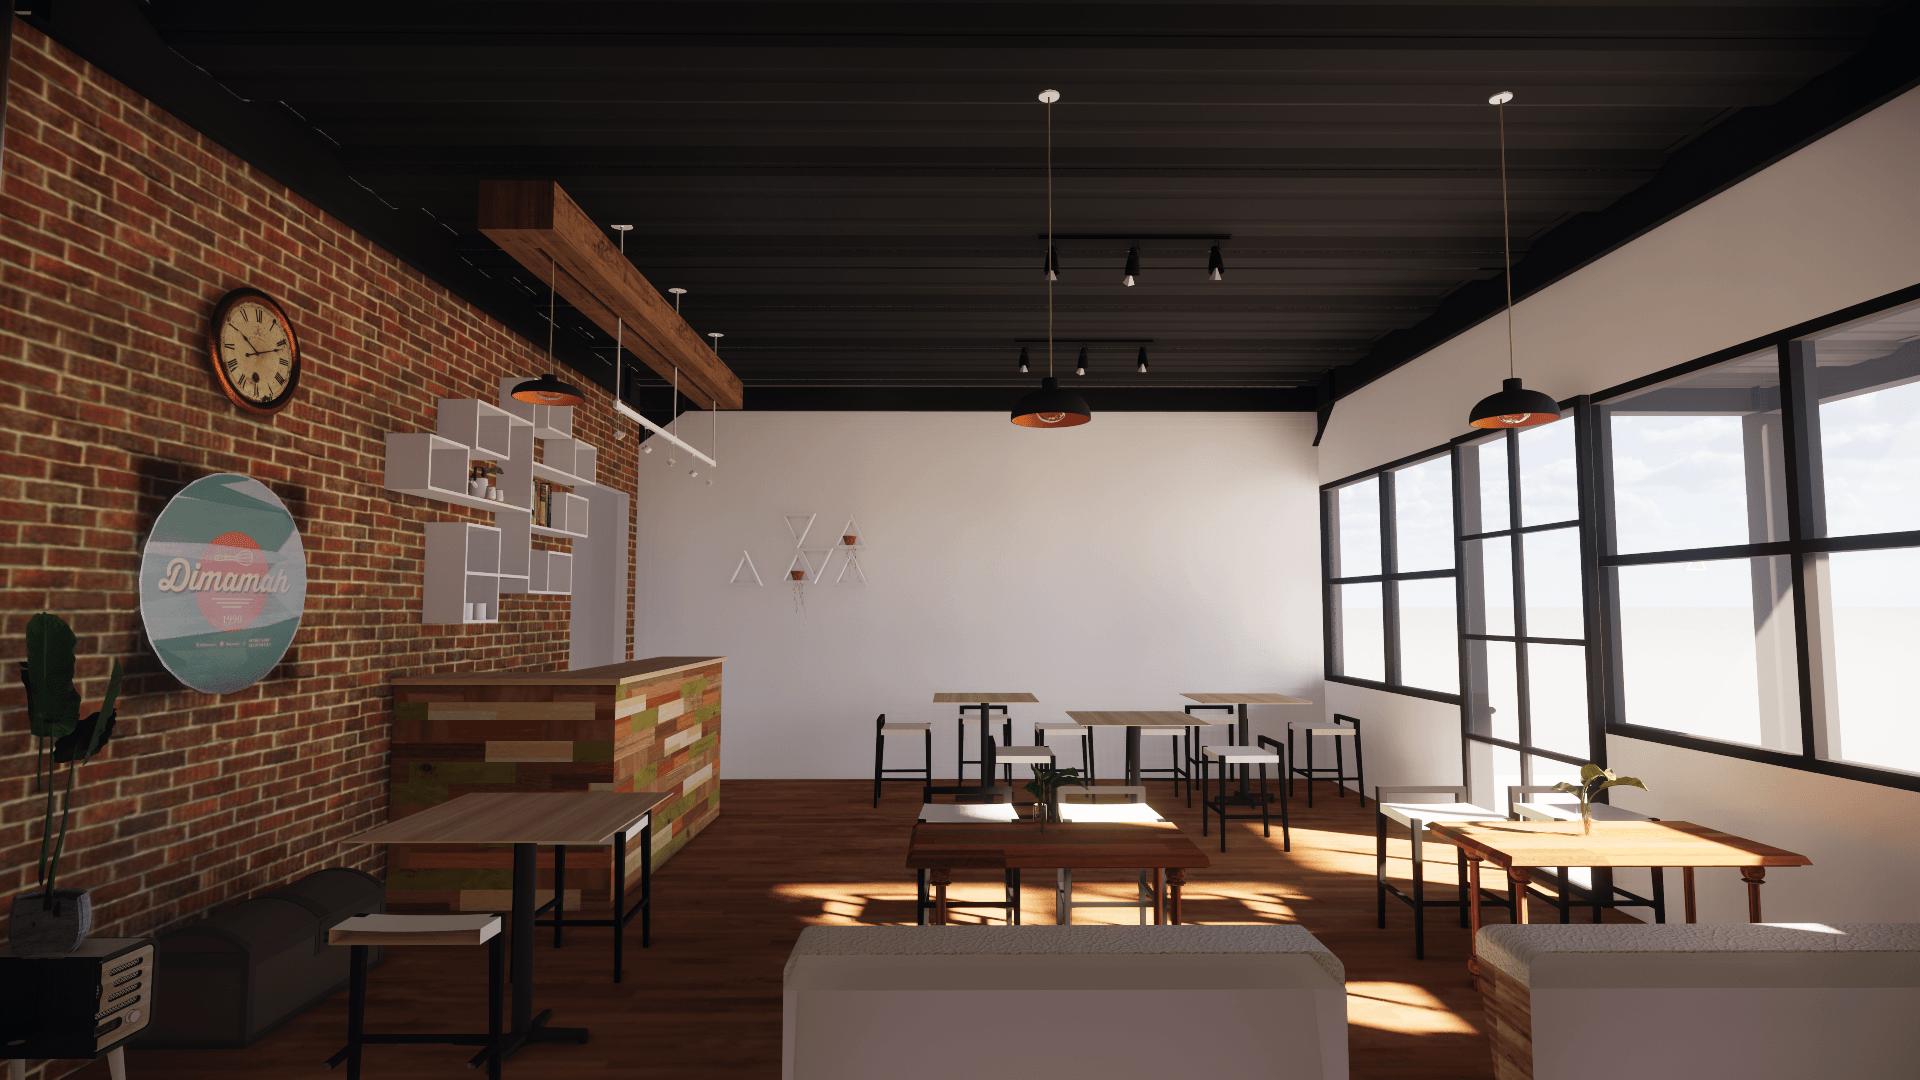 Menata Kolaboratif Studio Cafe Dimamah Bogor Bogor, Jawa Barat, Indonesia Bogor, Jawa Barat, Indonesia Menata-Kolaboratif-Studio-Cafe-Dimamah-Bogor  103968